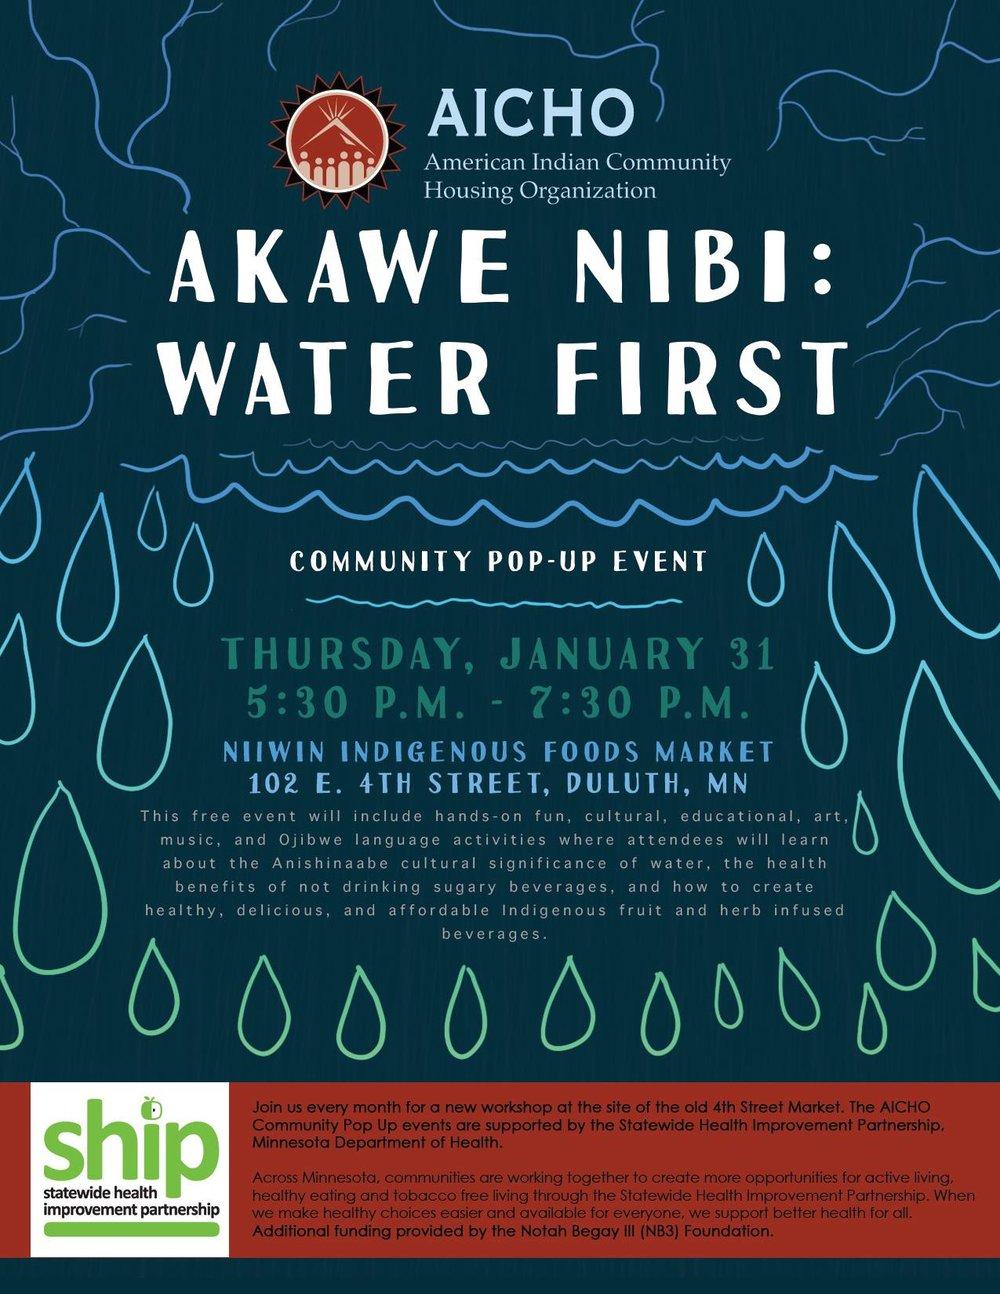 Akawe Nibi Water First poster. Photo courtesy of AICHO.jpg